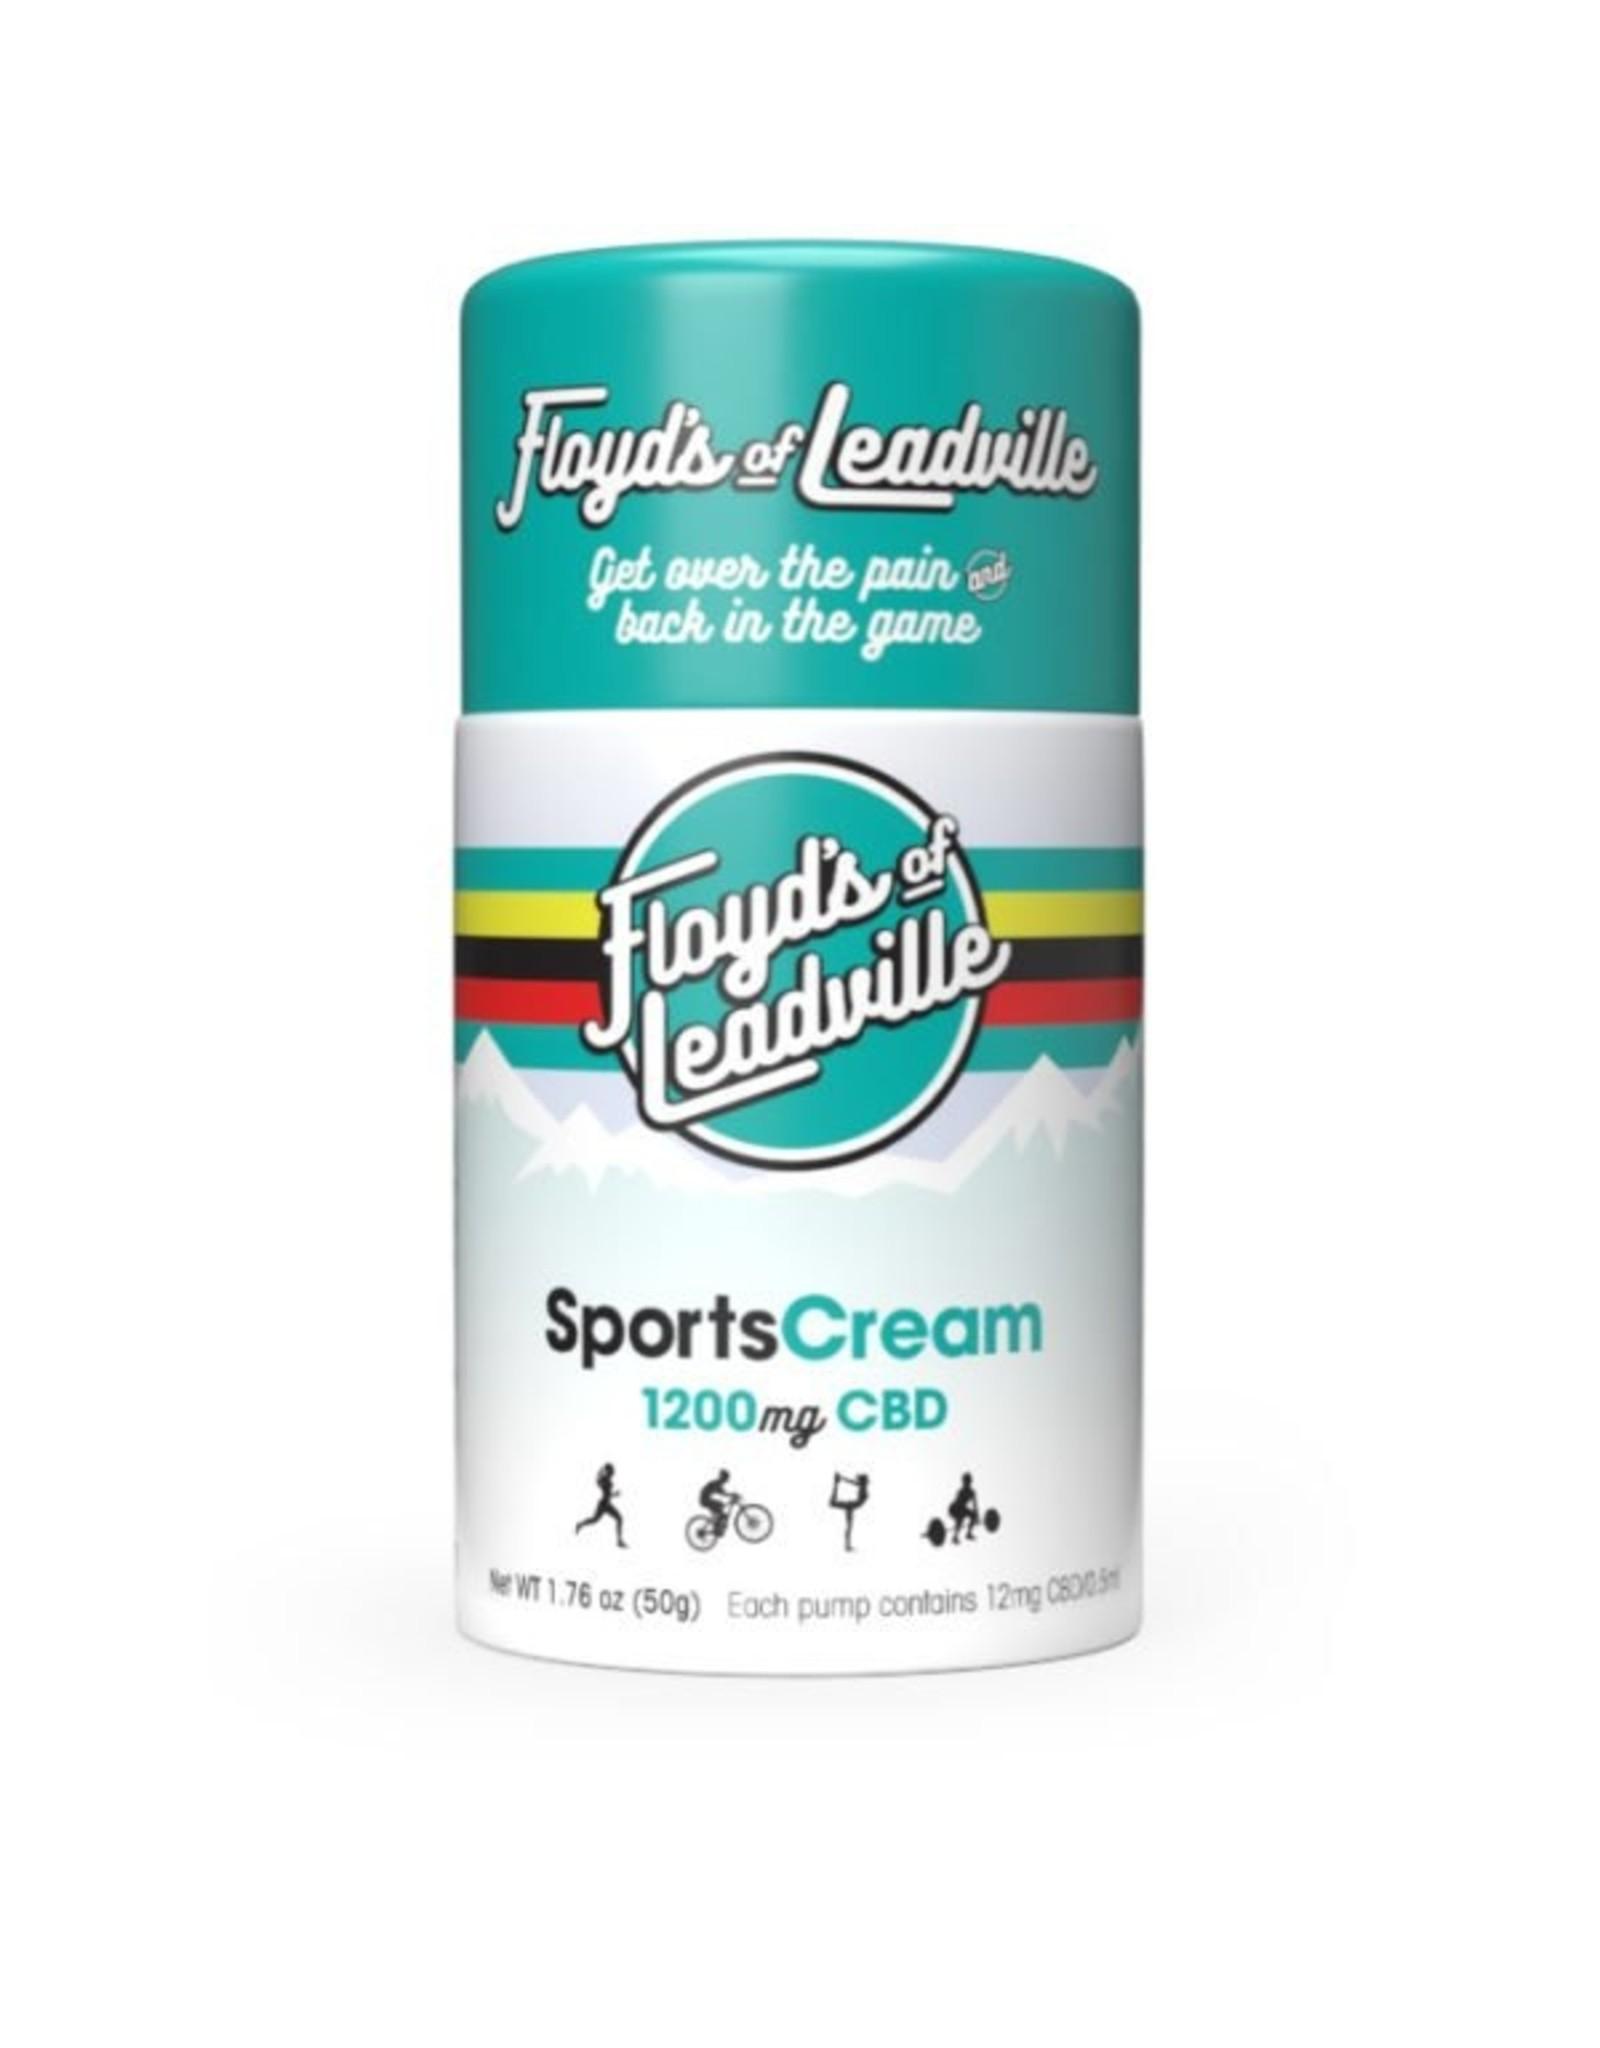 Floyd's of Leadville Floyd's of Leadville CBD Transdermal Cream: Isolate (THC Free) 1200mg